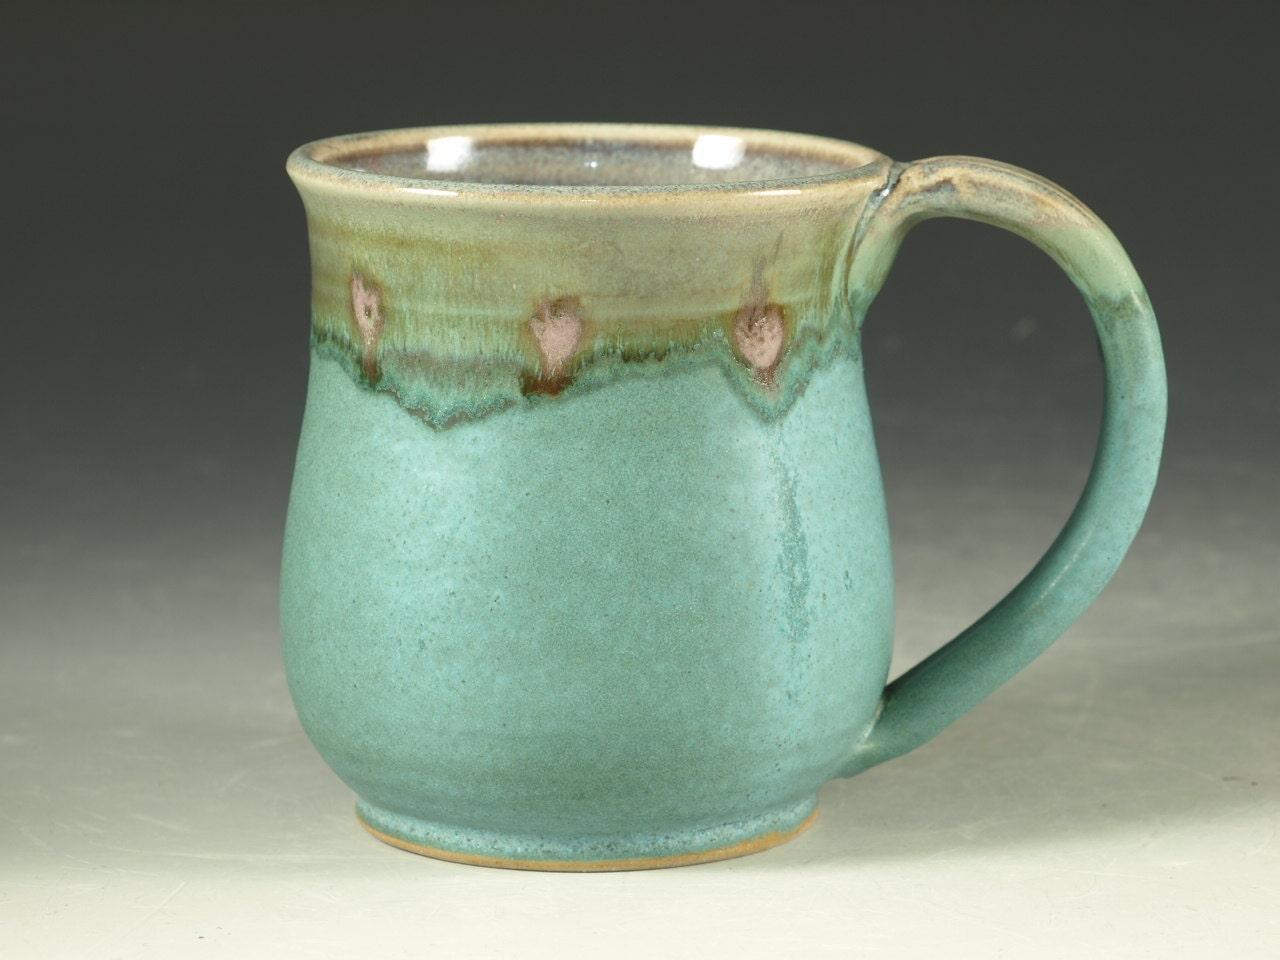 Coffee Mug 12oz Small In Turquoise Glaze